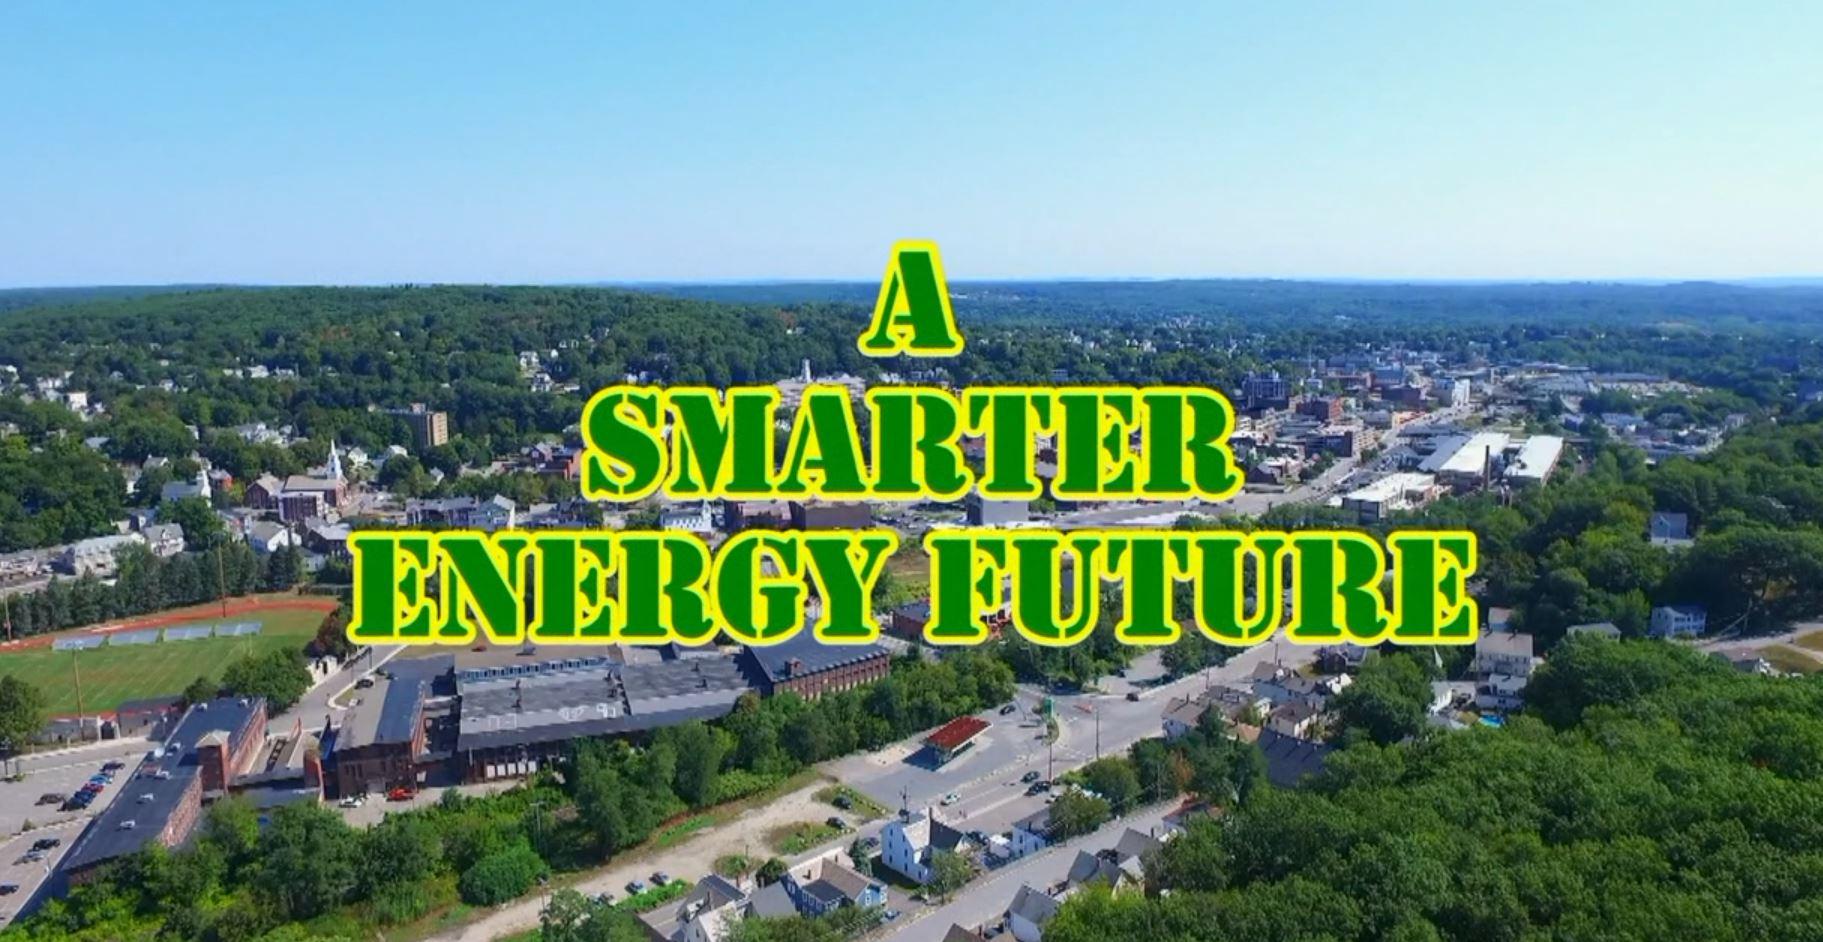 smarter energy future.JPG